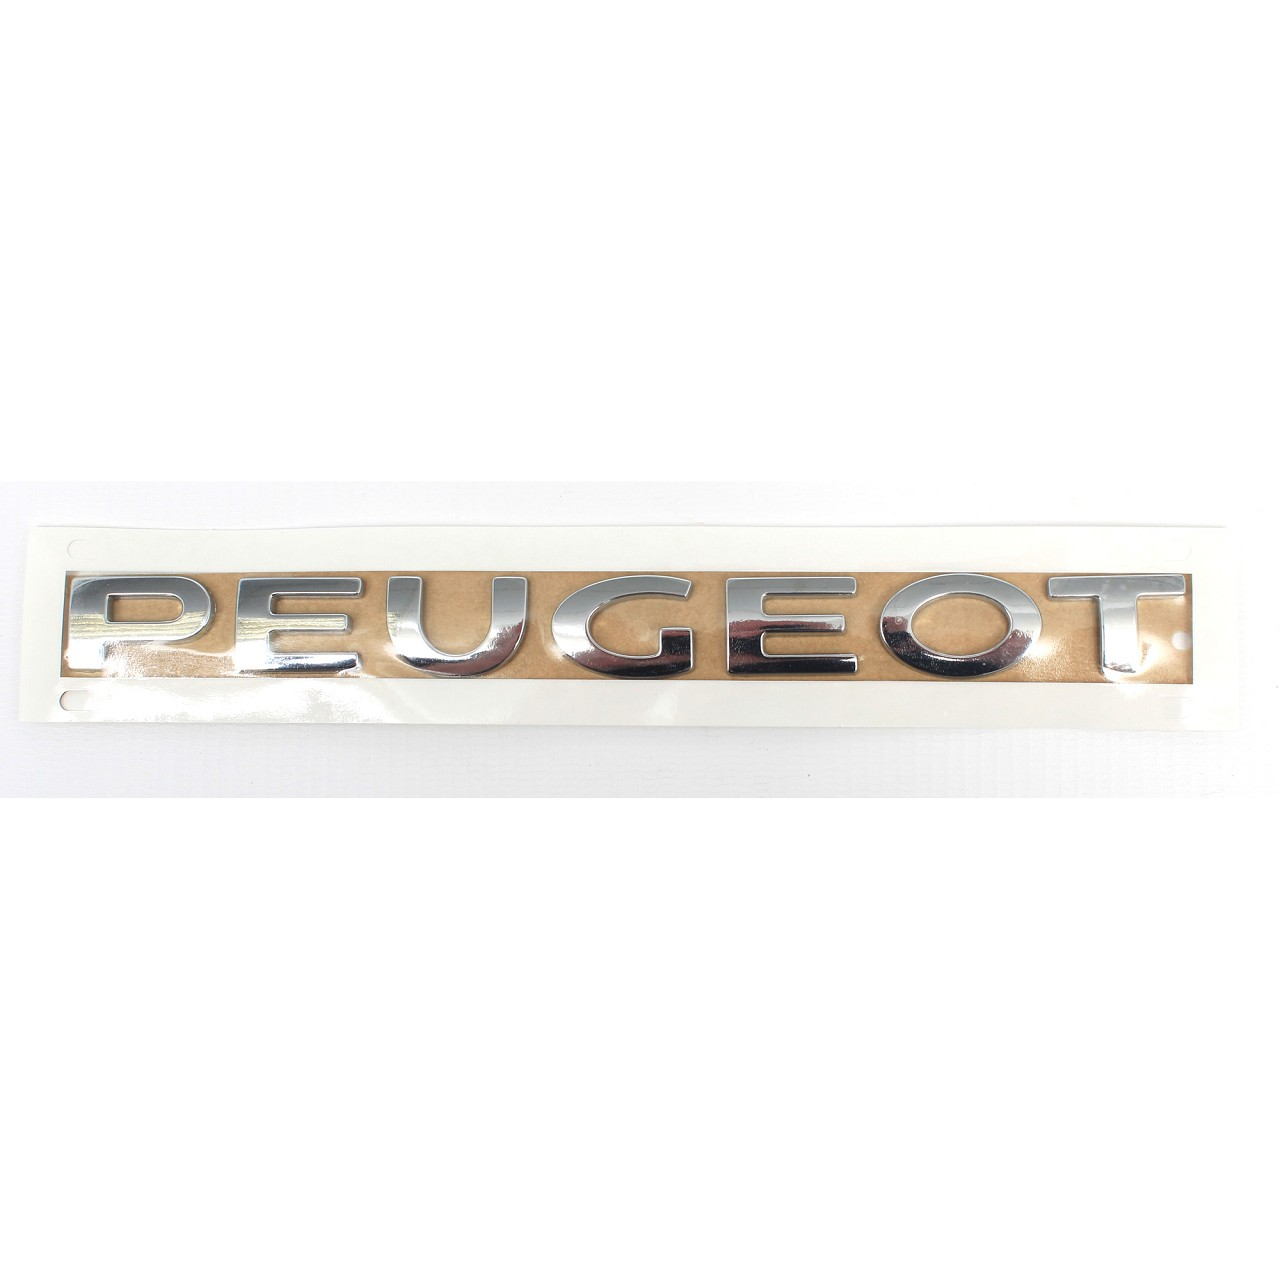 ORIGINAL Peugeot Emblem Plakette Logo Schriftzug Heckklappe 3008 5008 8666.72